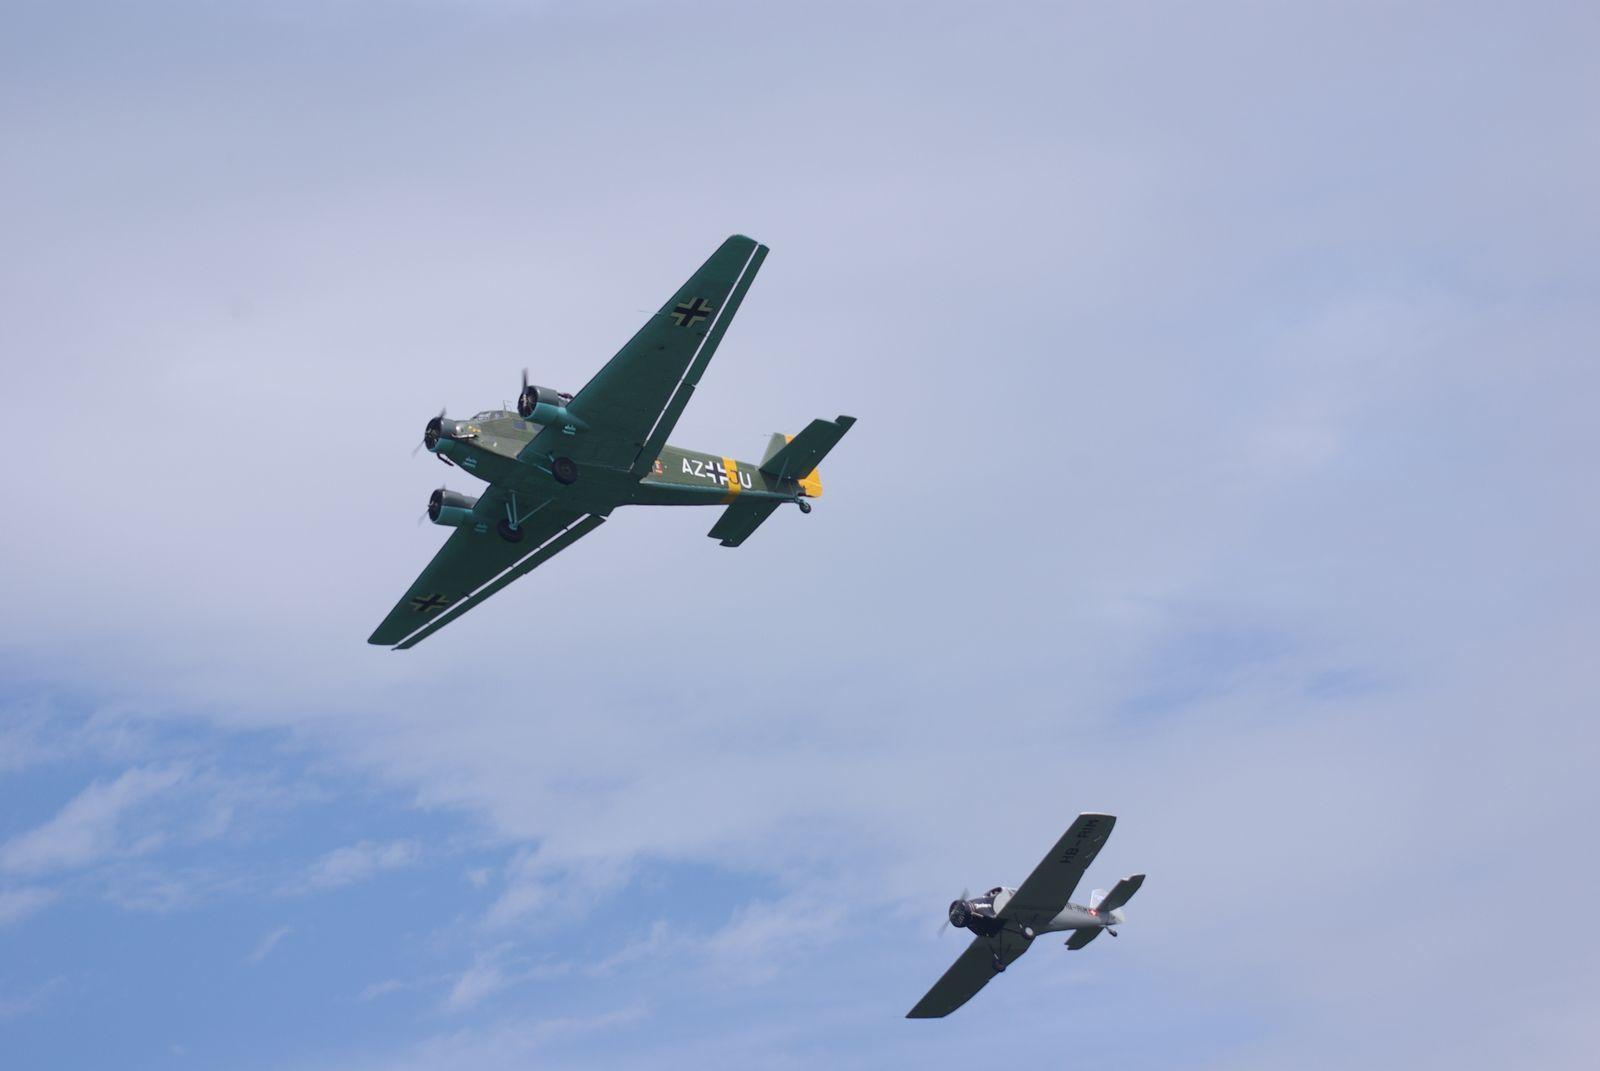 Le Junkers 52 F-AZJU, de l'AJBS, après de grands travaux d'hiver et les capots verts accompagné de la réplique de Junkers F13.